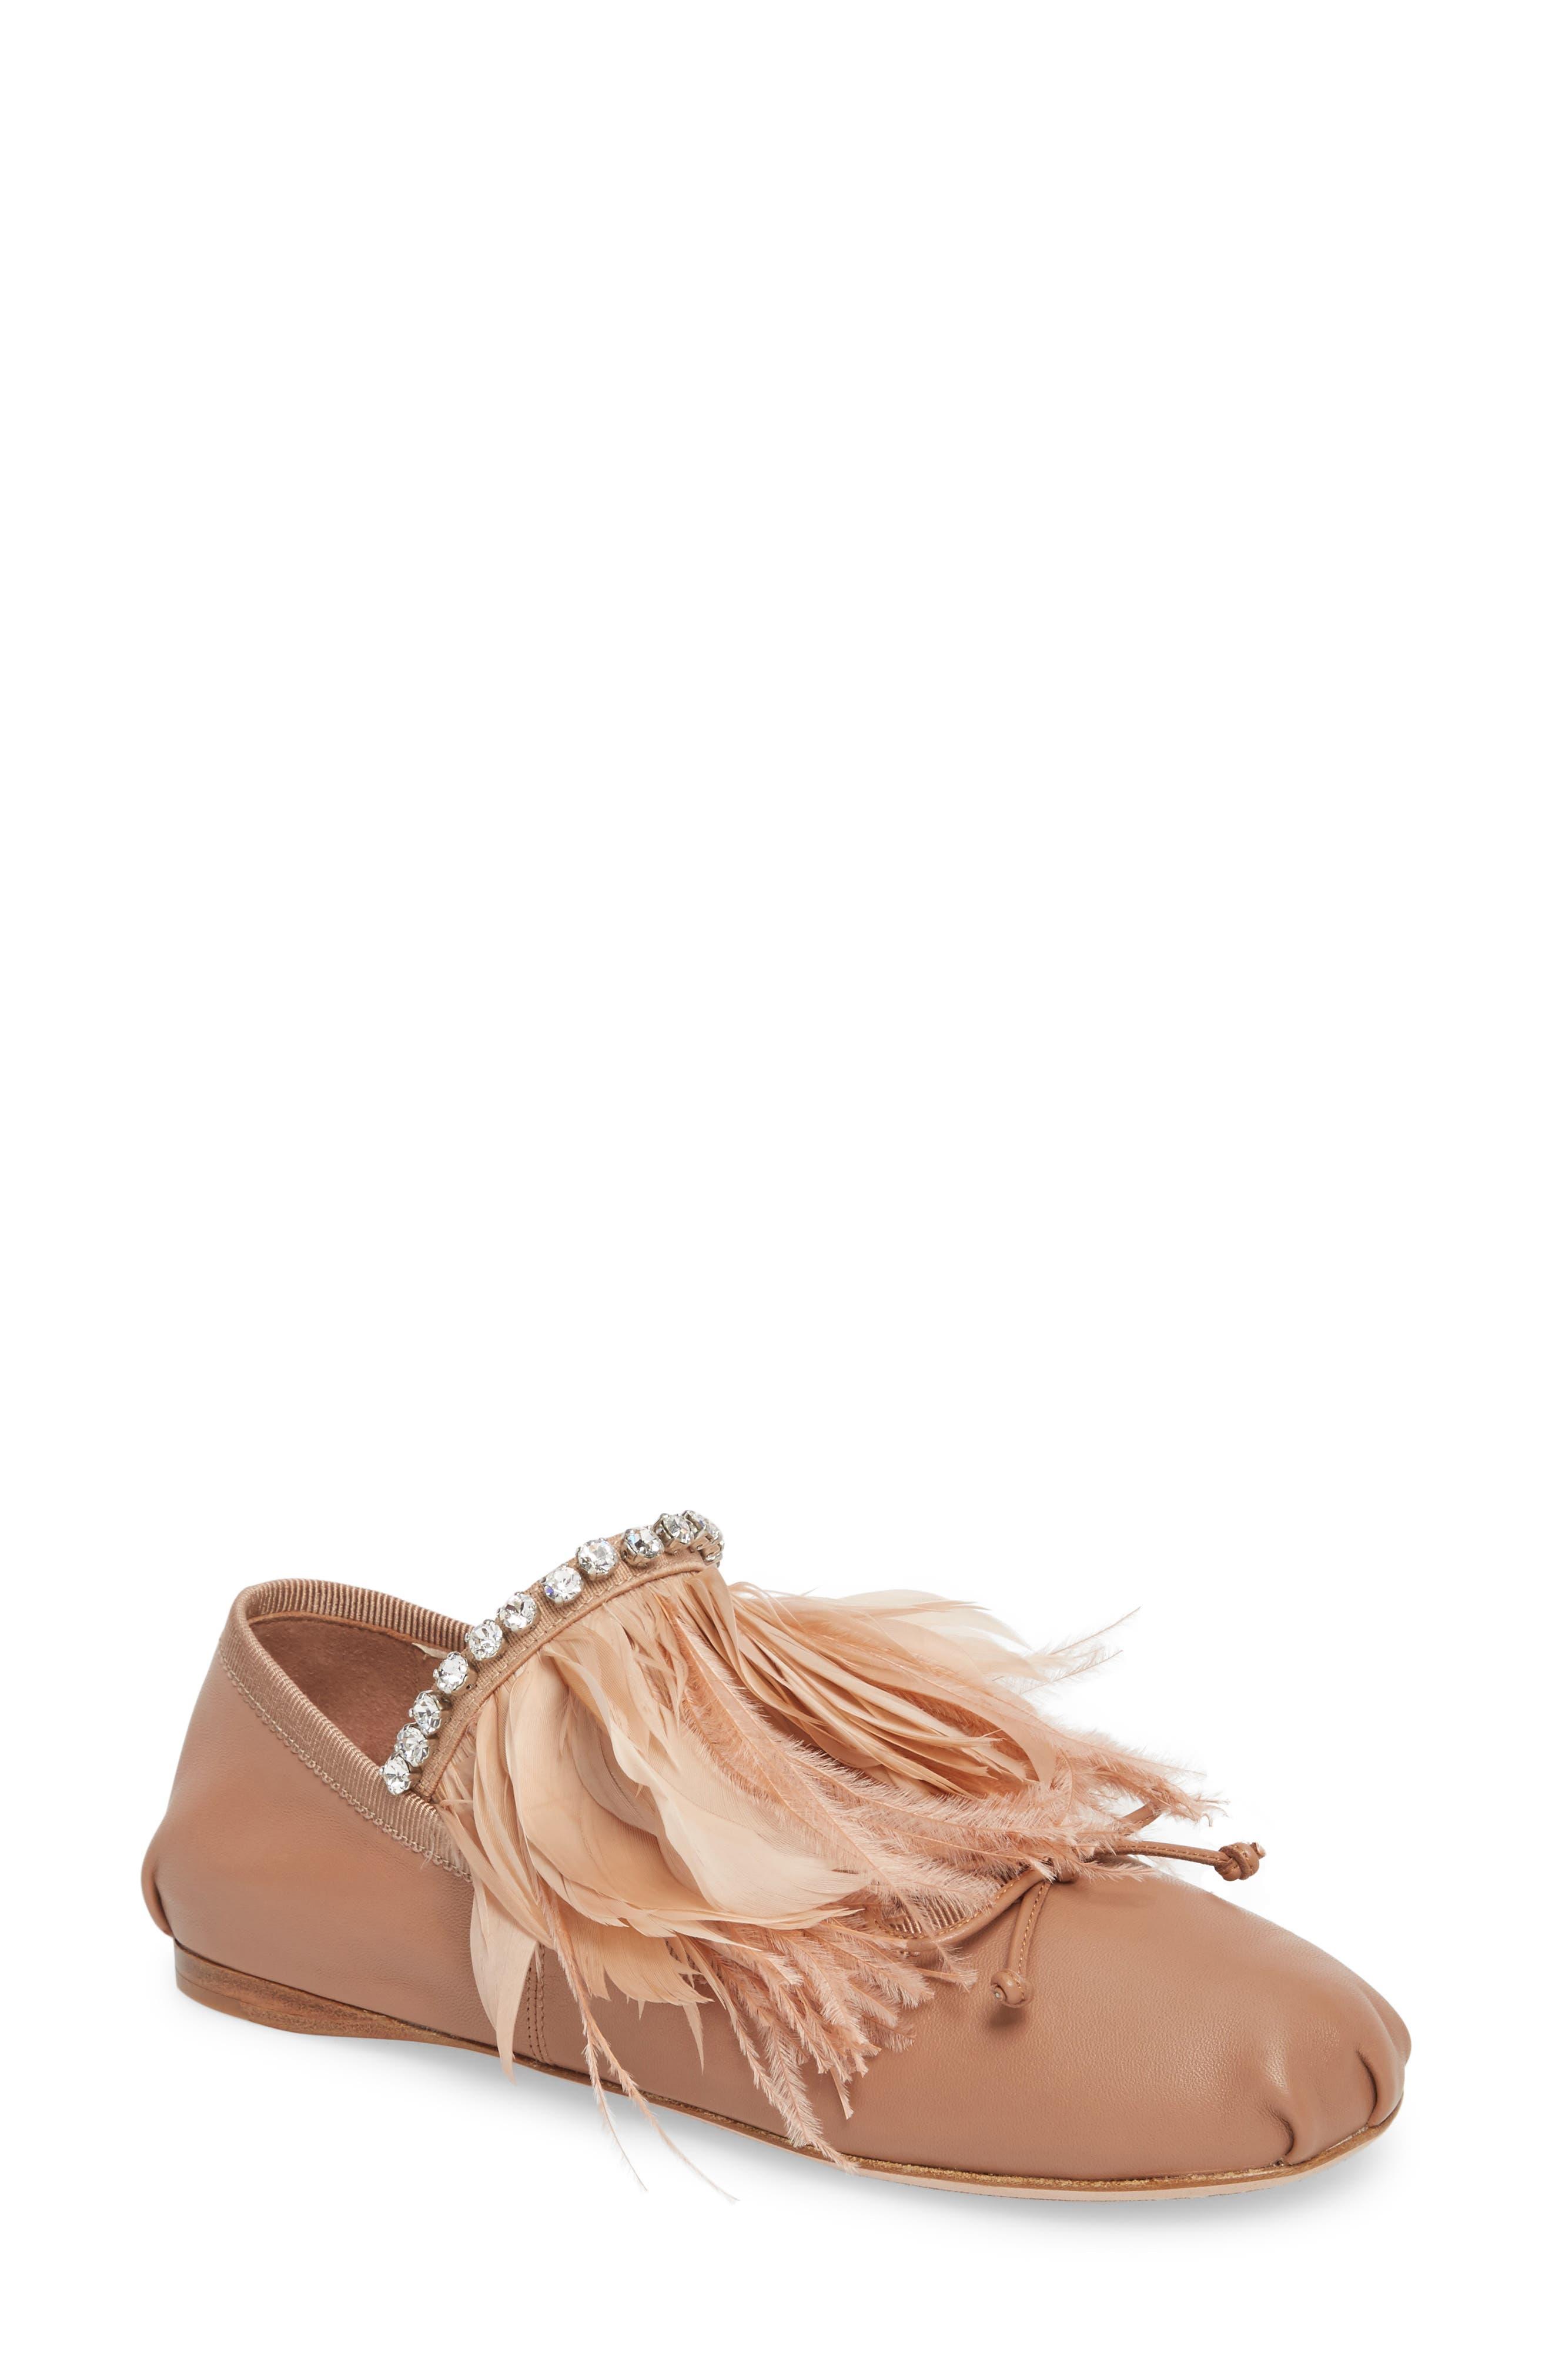 Feather Embellished Ballet Flat,                         Main,                         color, Pink